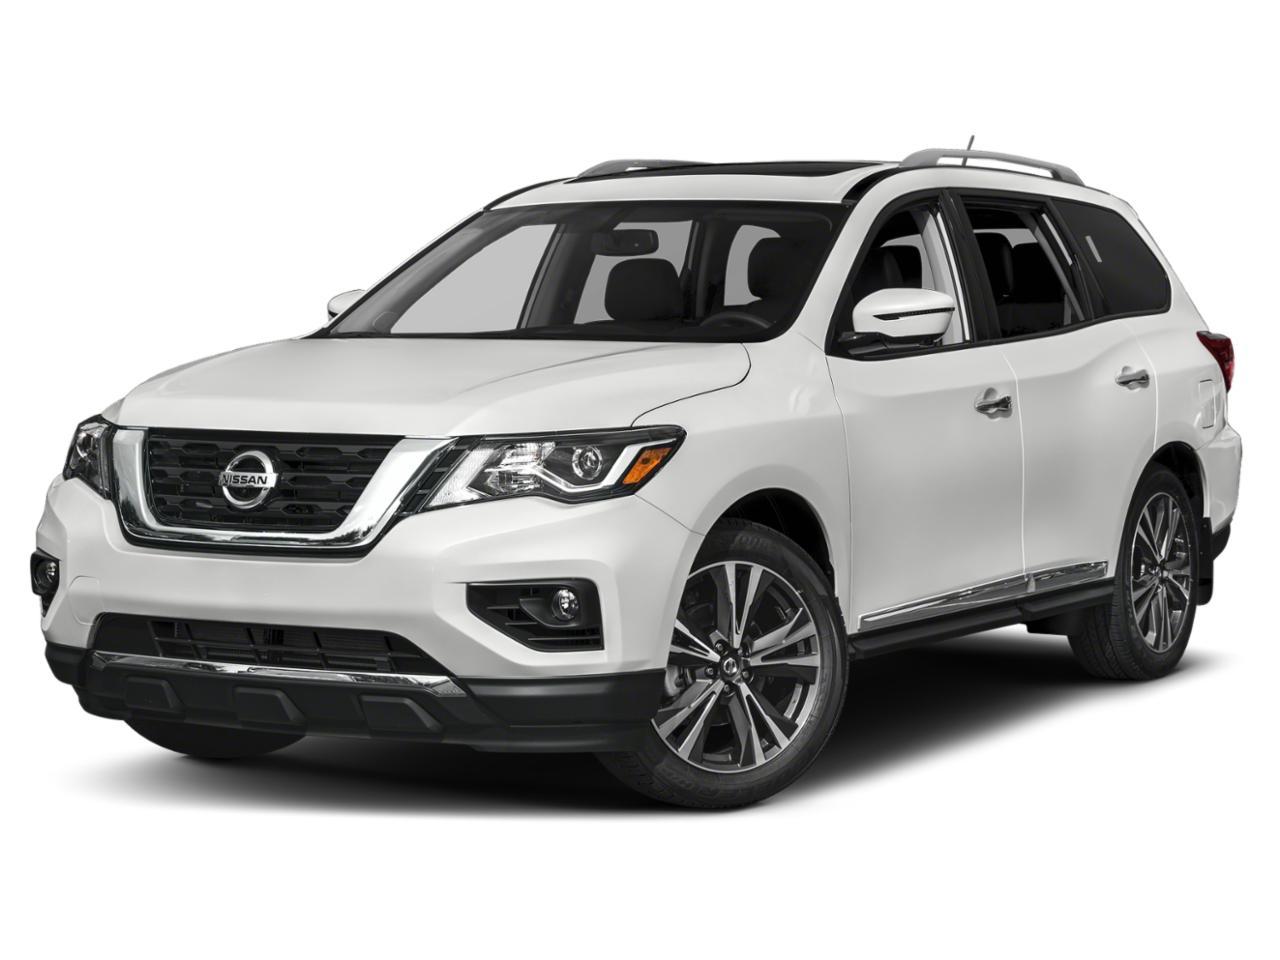 2019 Nissan Pathfinder Vehicle Photo in Columbia, TN 38401